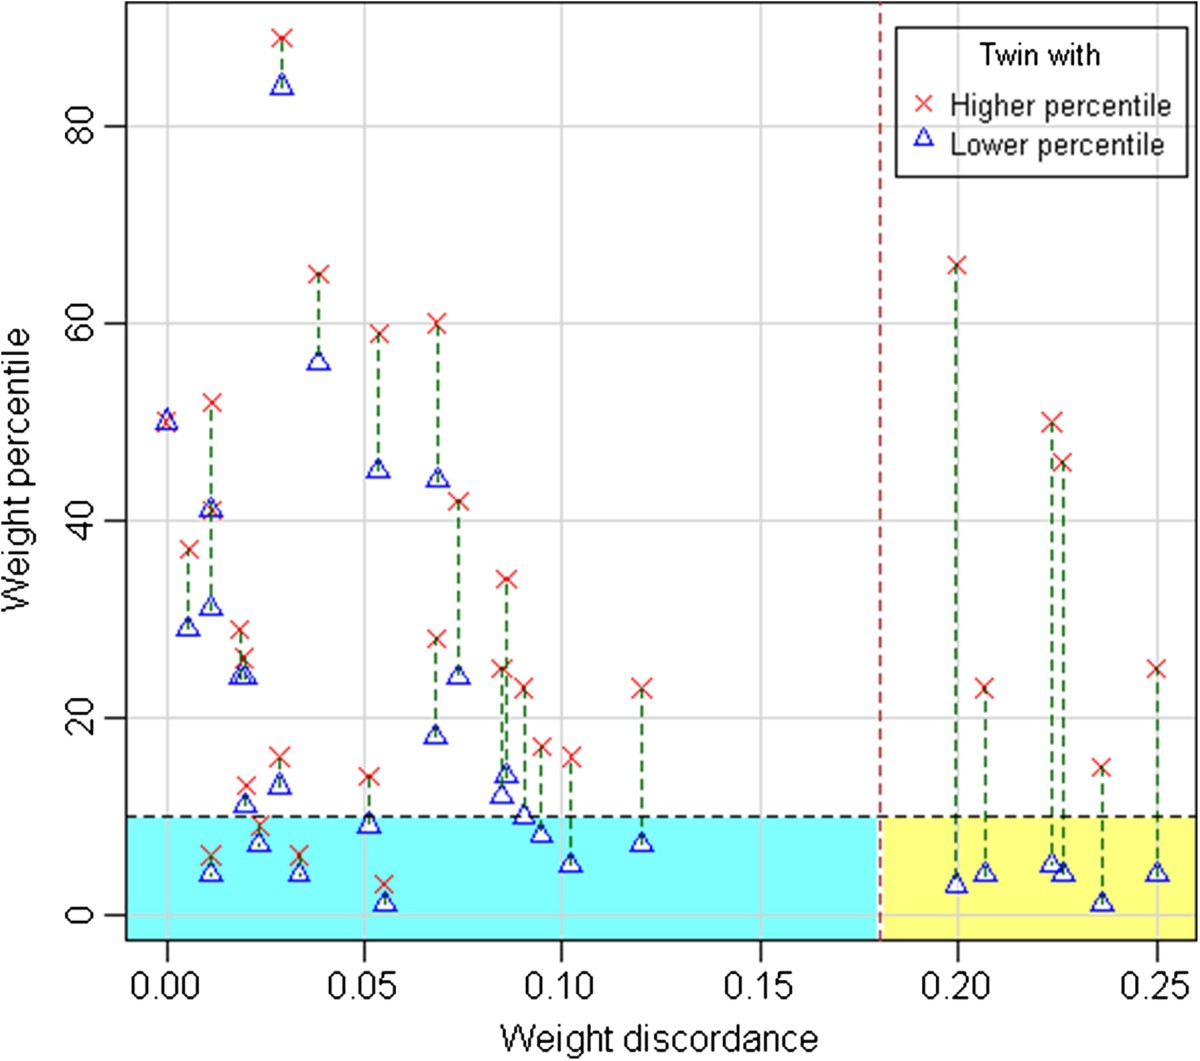 Intrauterine Growth Pattern And Birthweight Discordance In Twin